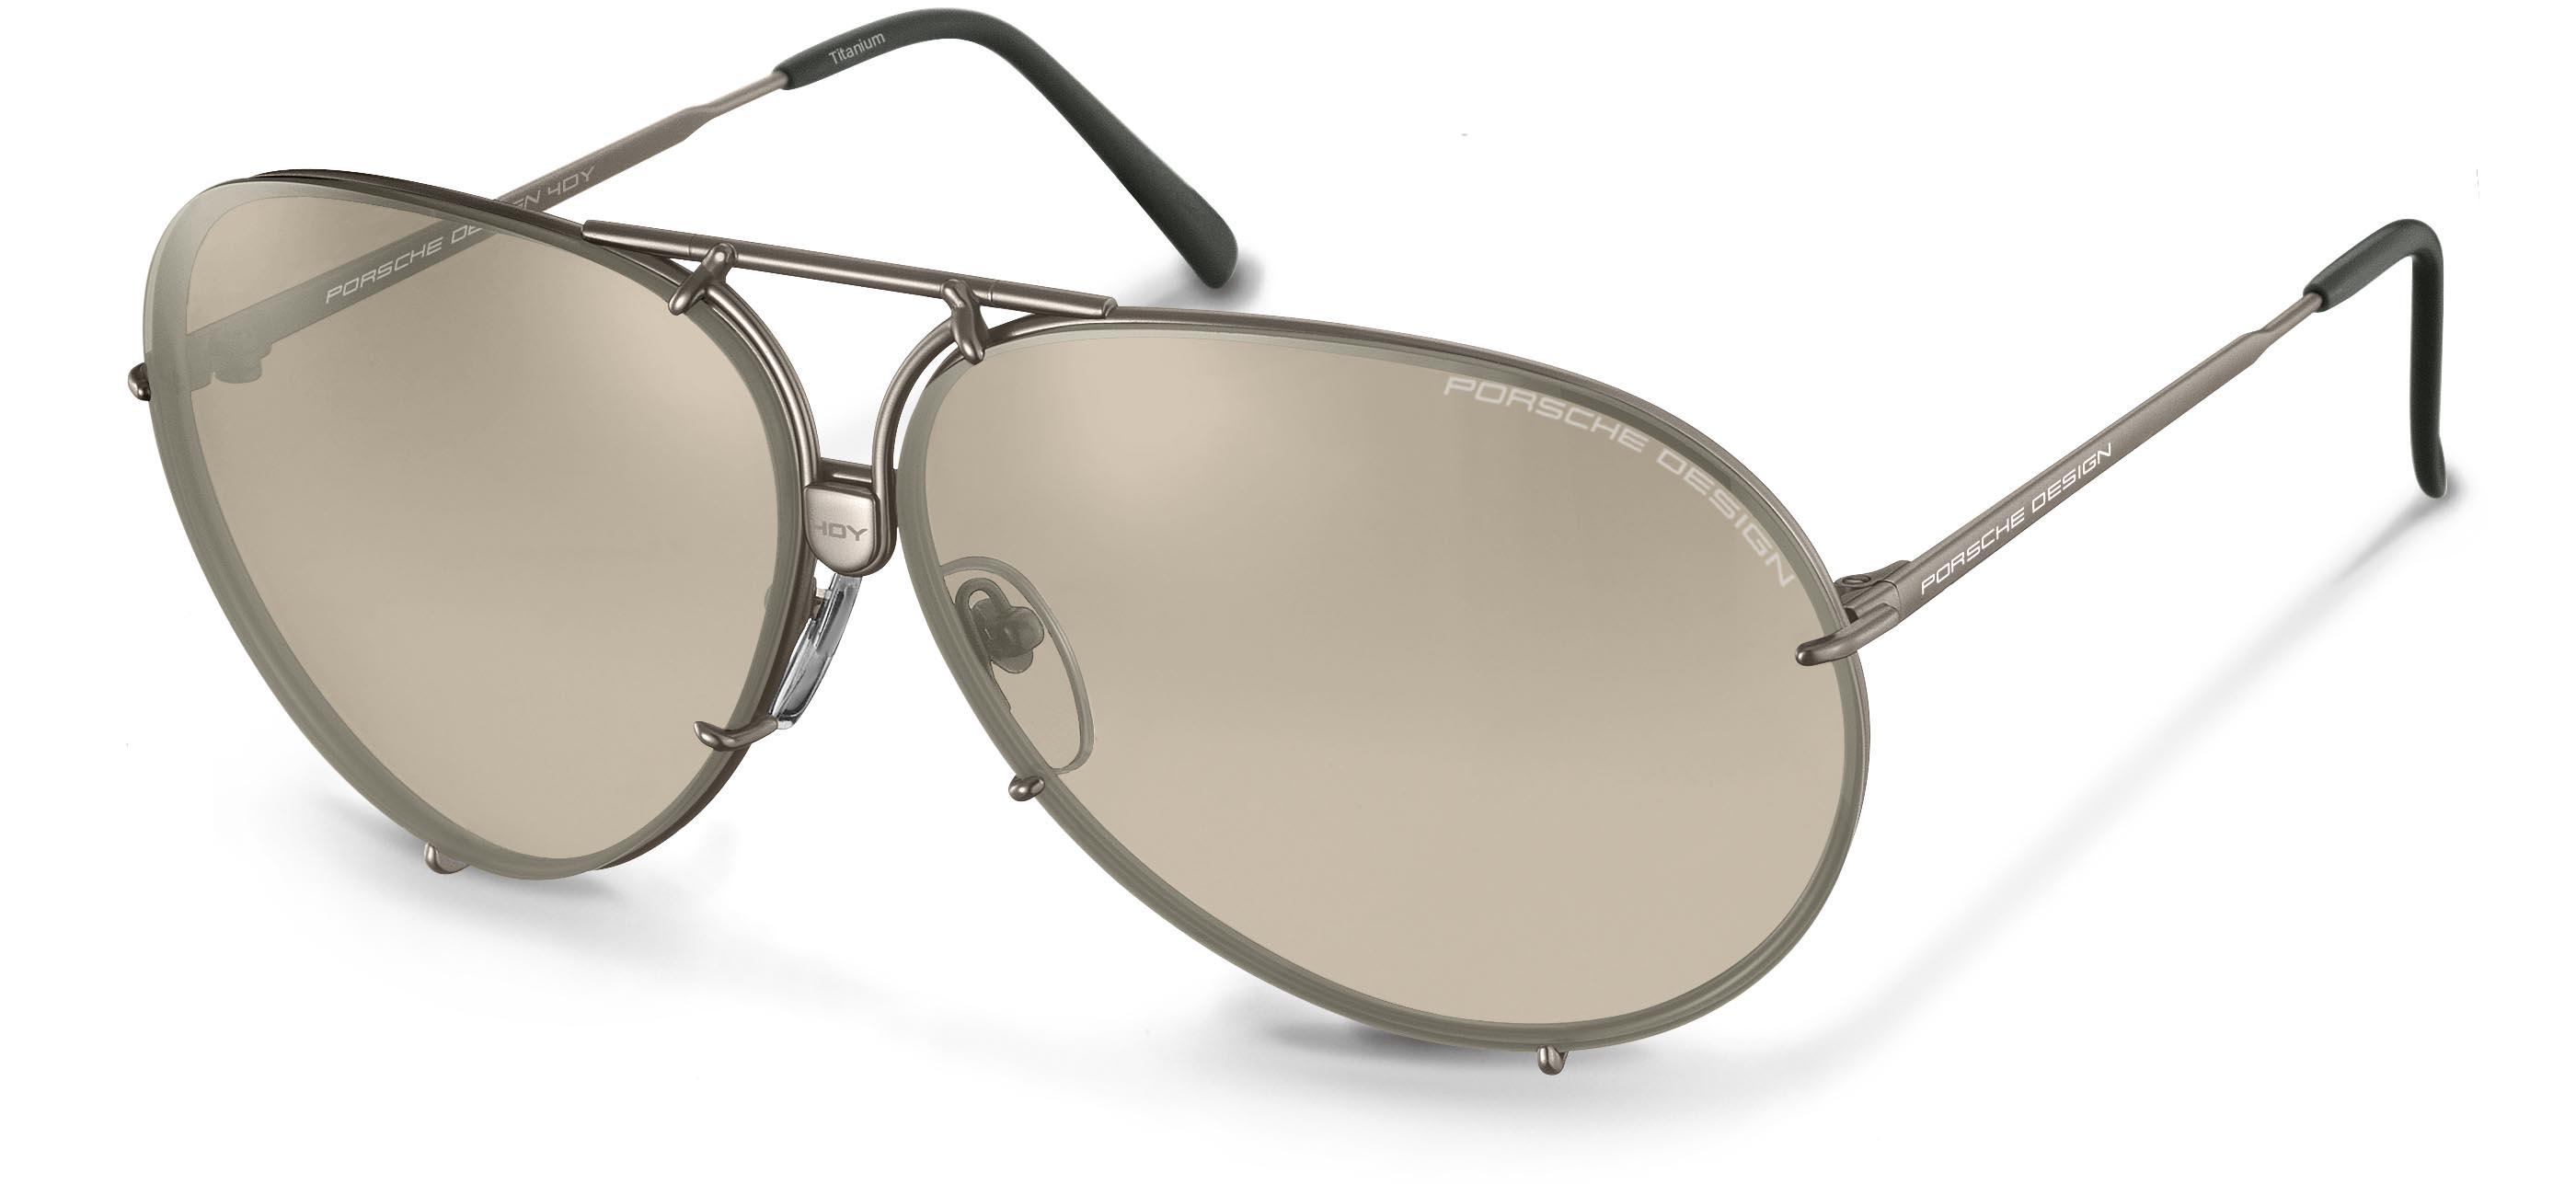 746f78d544e Porsche Design Products » Sunglasses P 8400. Click to Enlarge